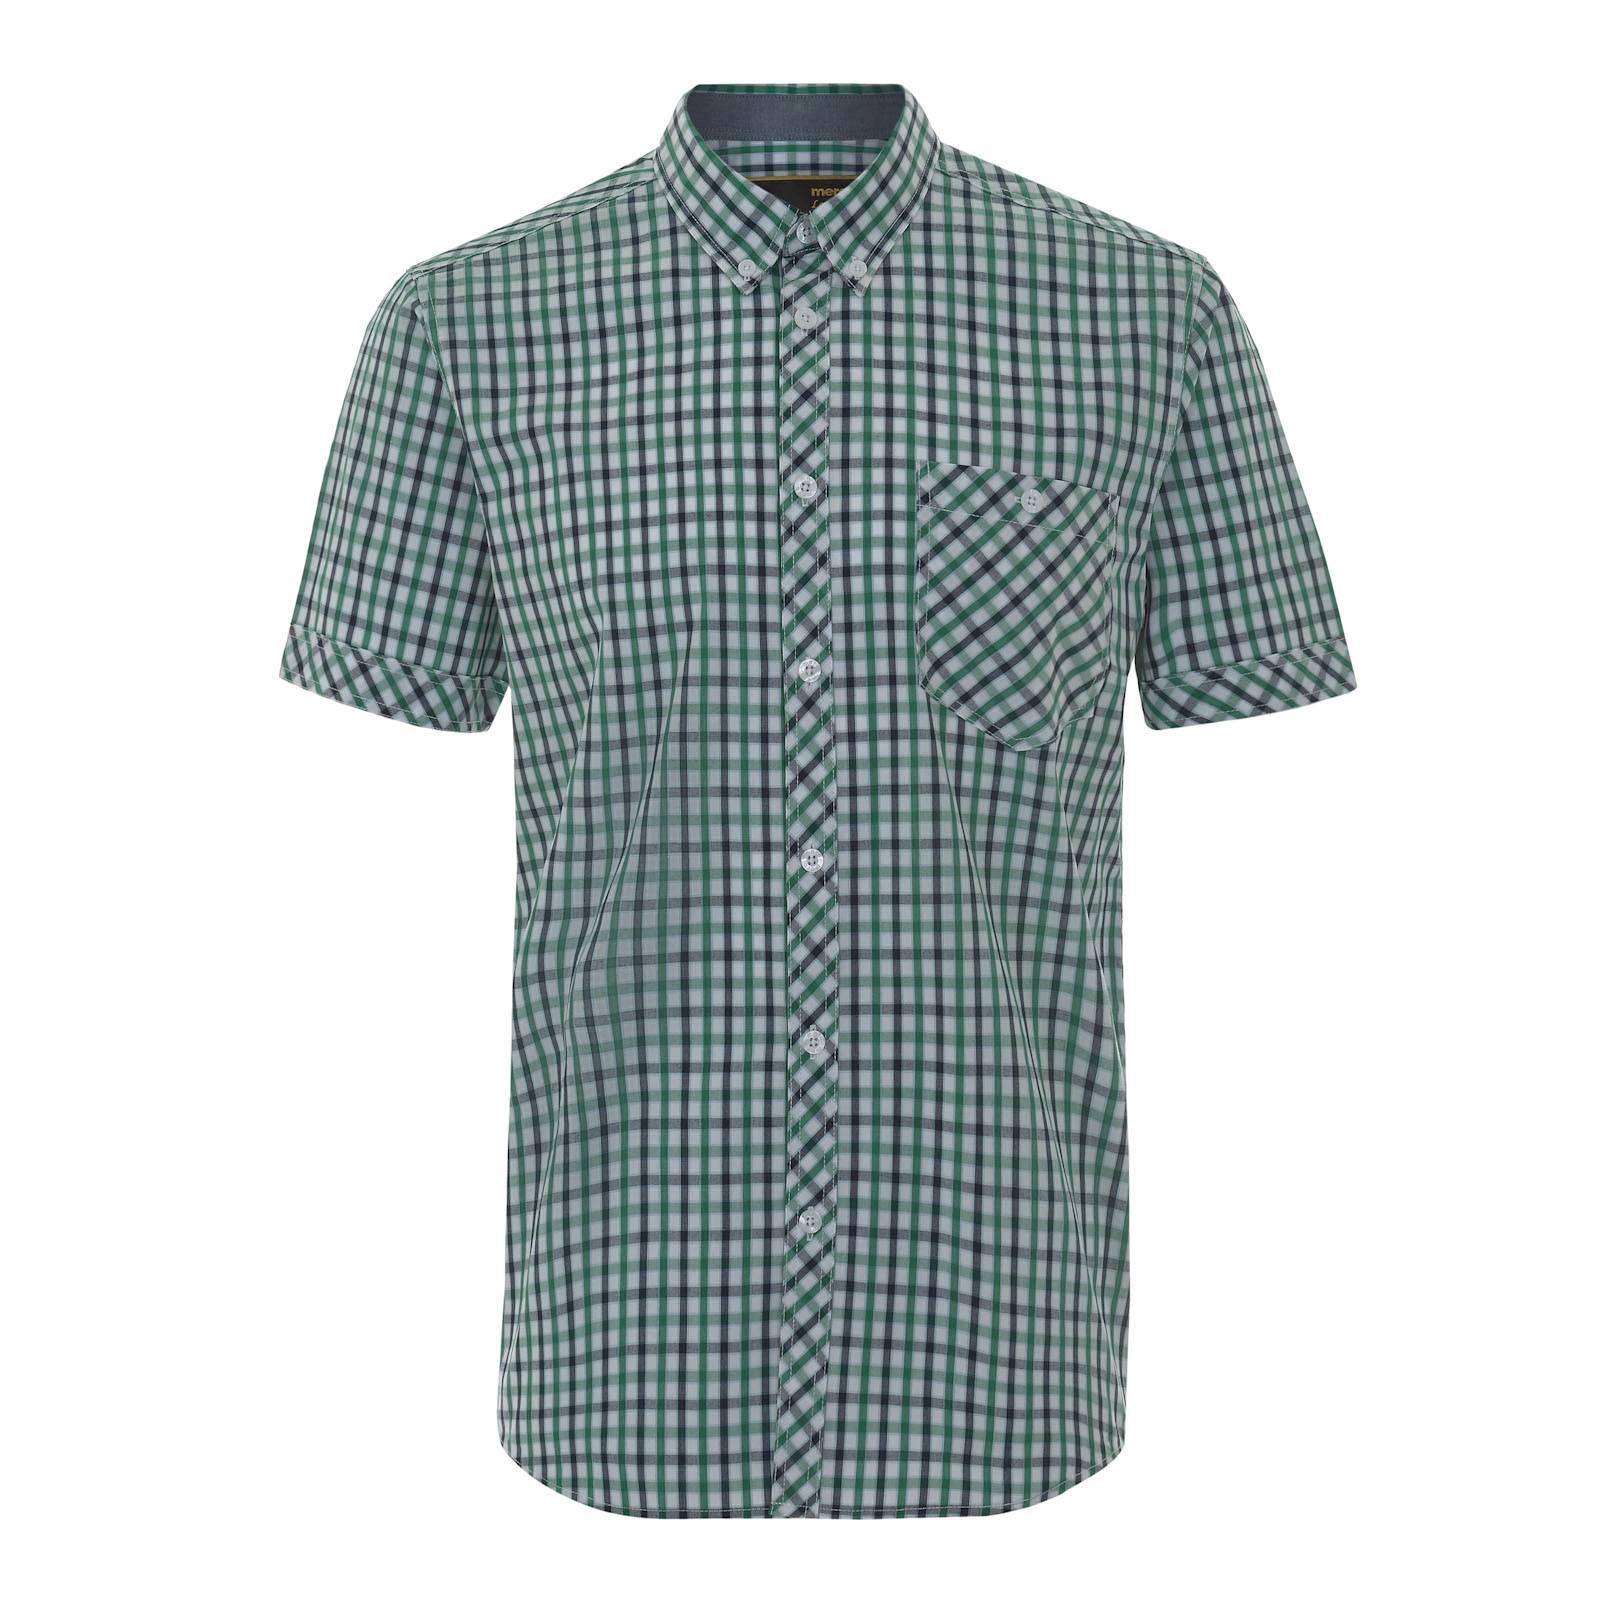 Рубашка JekyllРубашки<br><br><br>Артикул: 1515111<br>Материал: 65% полиэстер, 35% хлопок<br>Цвет: зеленый<br>Пол: Мужской